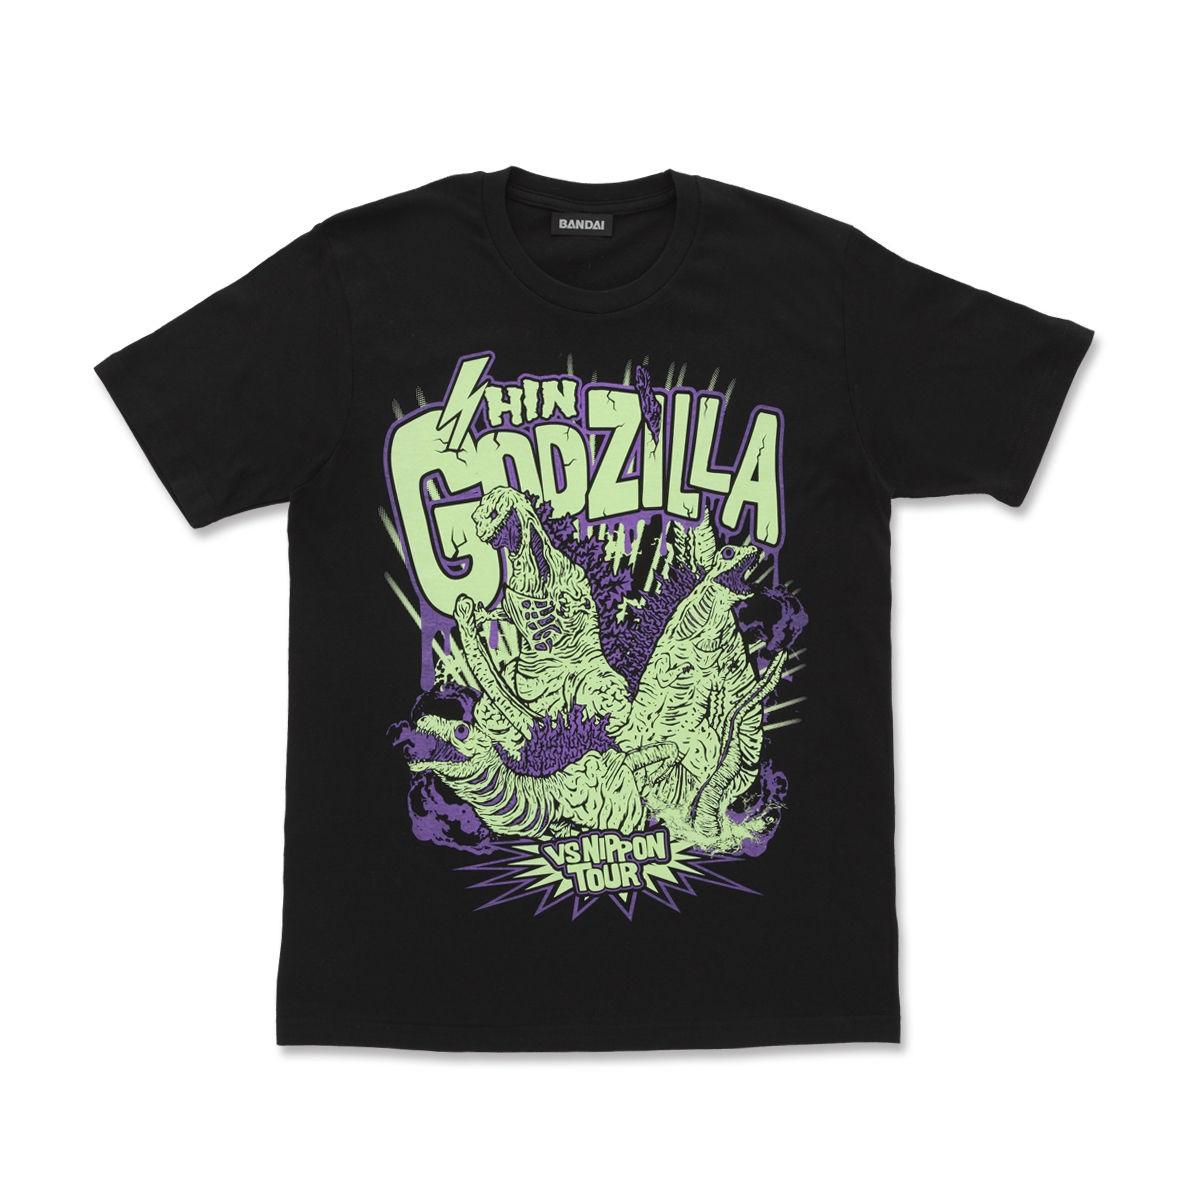 3 Forms of Godzilla in Shin Godzilla feat. STUDIO696 T-shirt